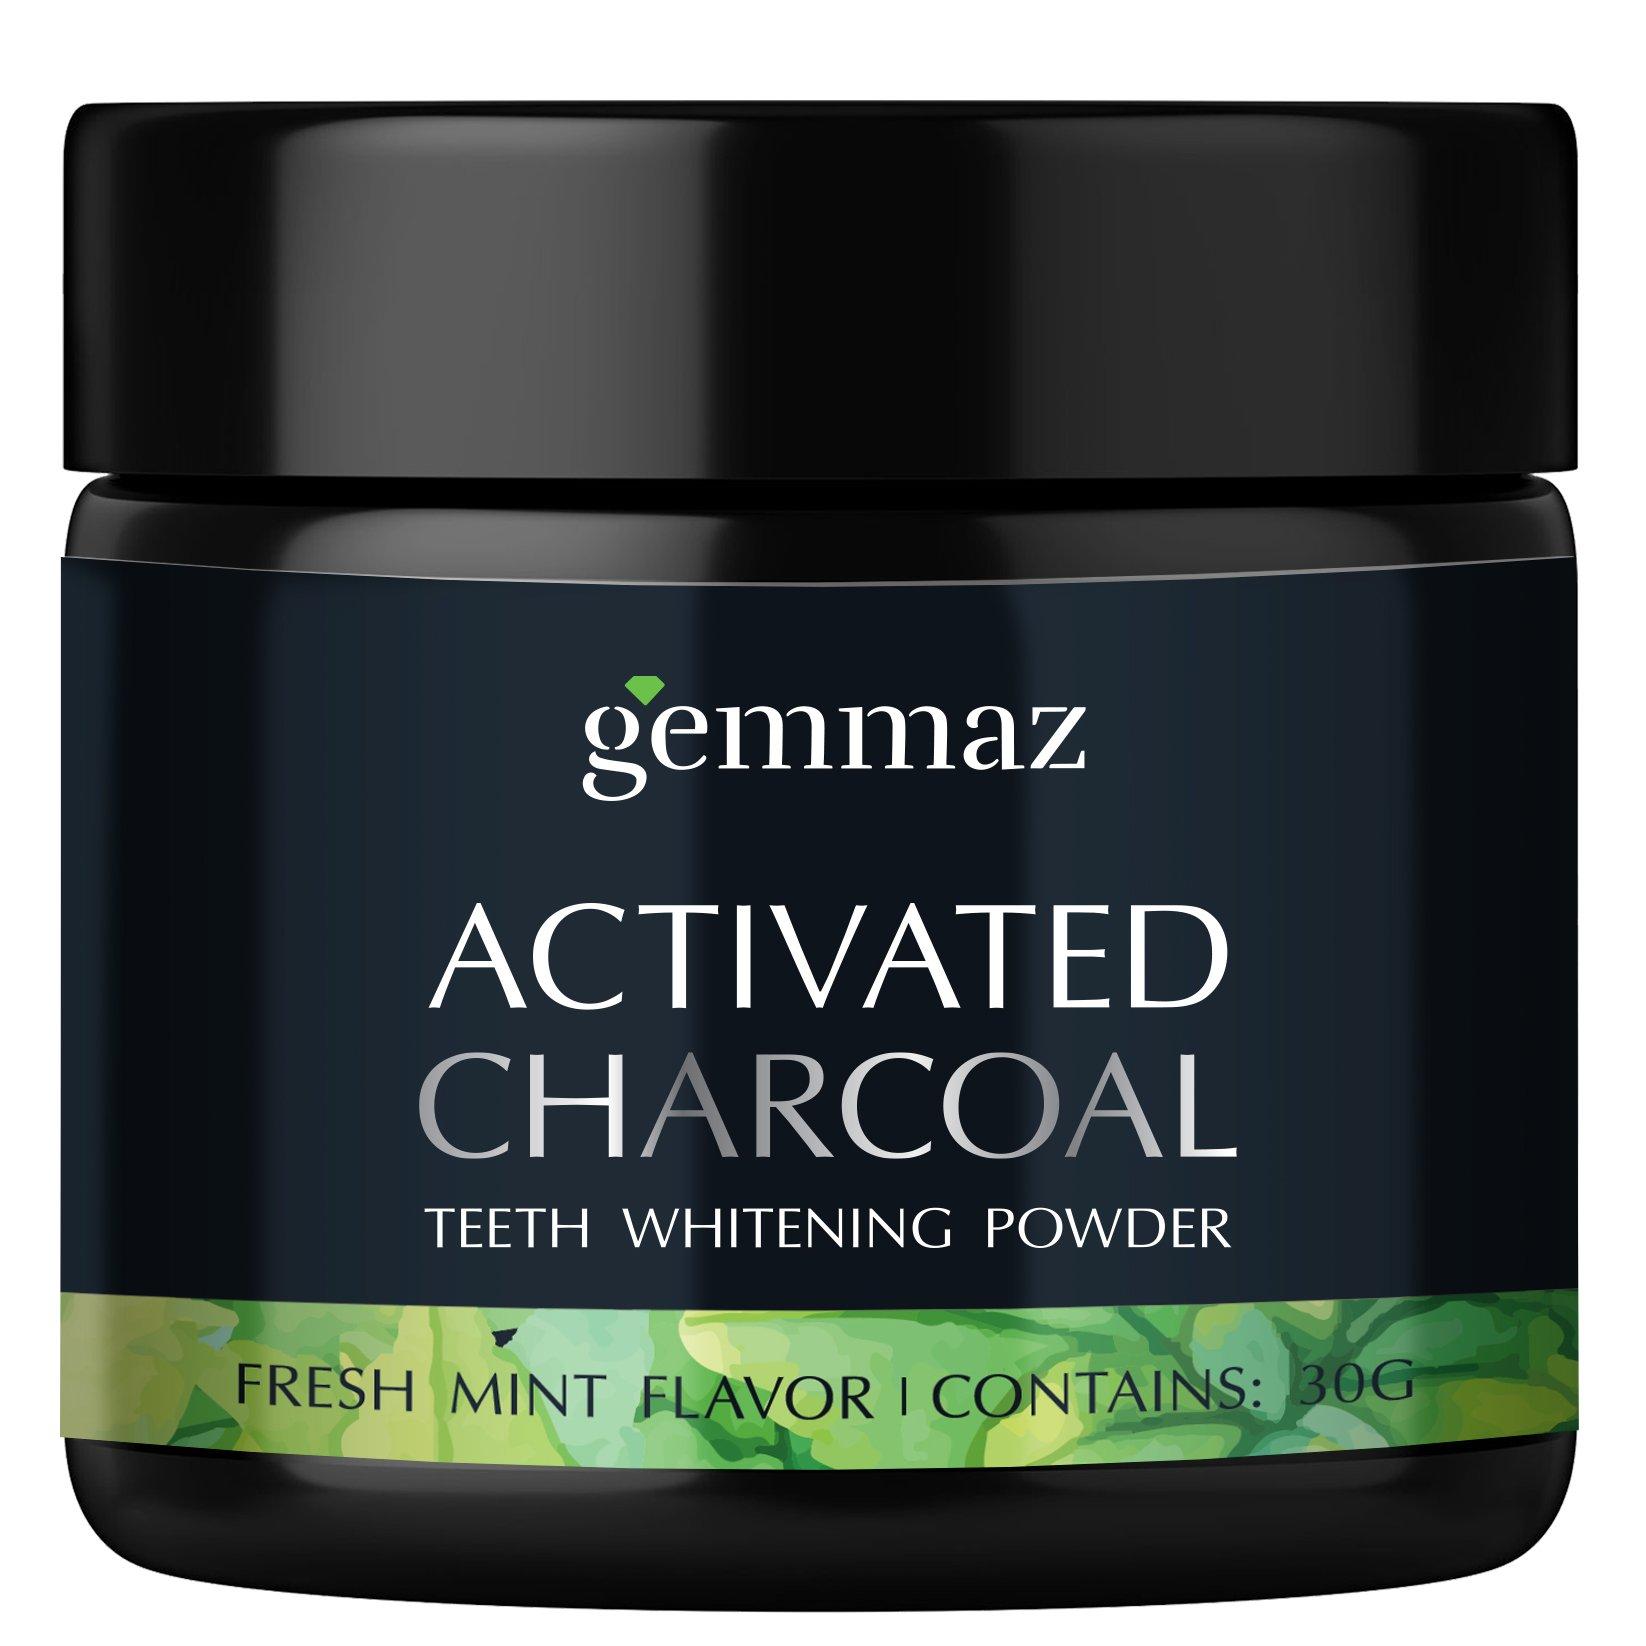 Gemmaz Charcoal Teeth Whitening Powder, Coconut Activated Charcoal Teeth Whitening, Enamel Safe Teeth Whitener for Sensitive Teeth Gums, Fresh Mint Flavor 30g